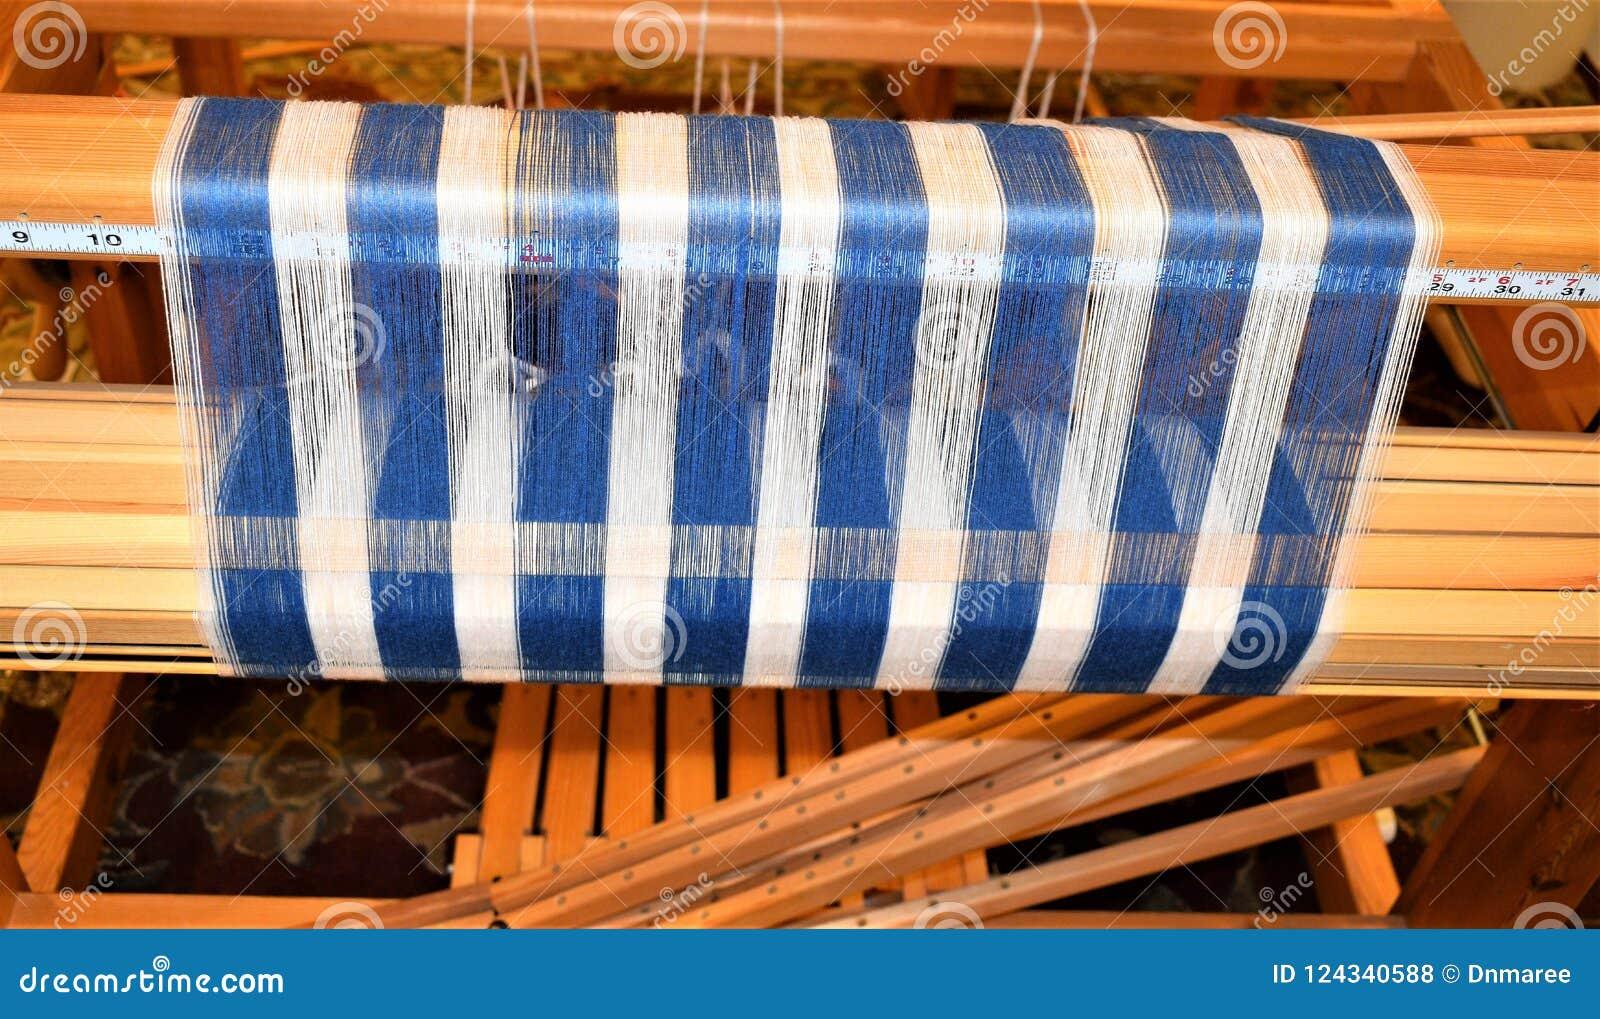 Closeup of Blue and white striped warp on back beam. Weaving. Handweaving. Textiles. Fiber.